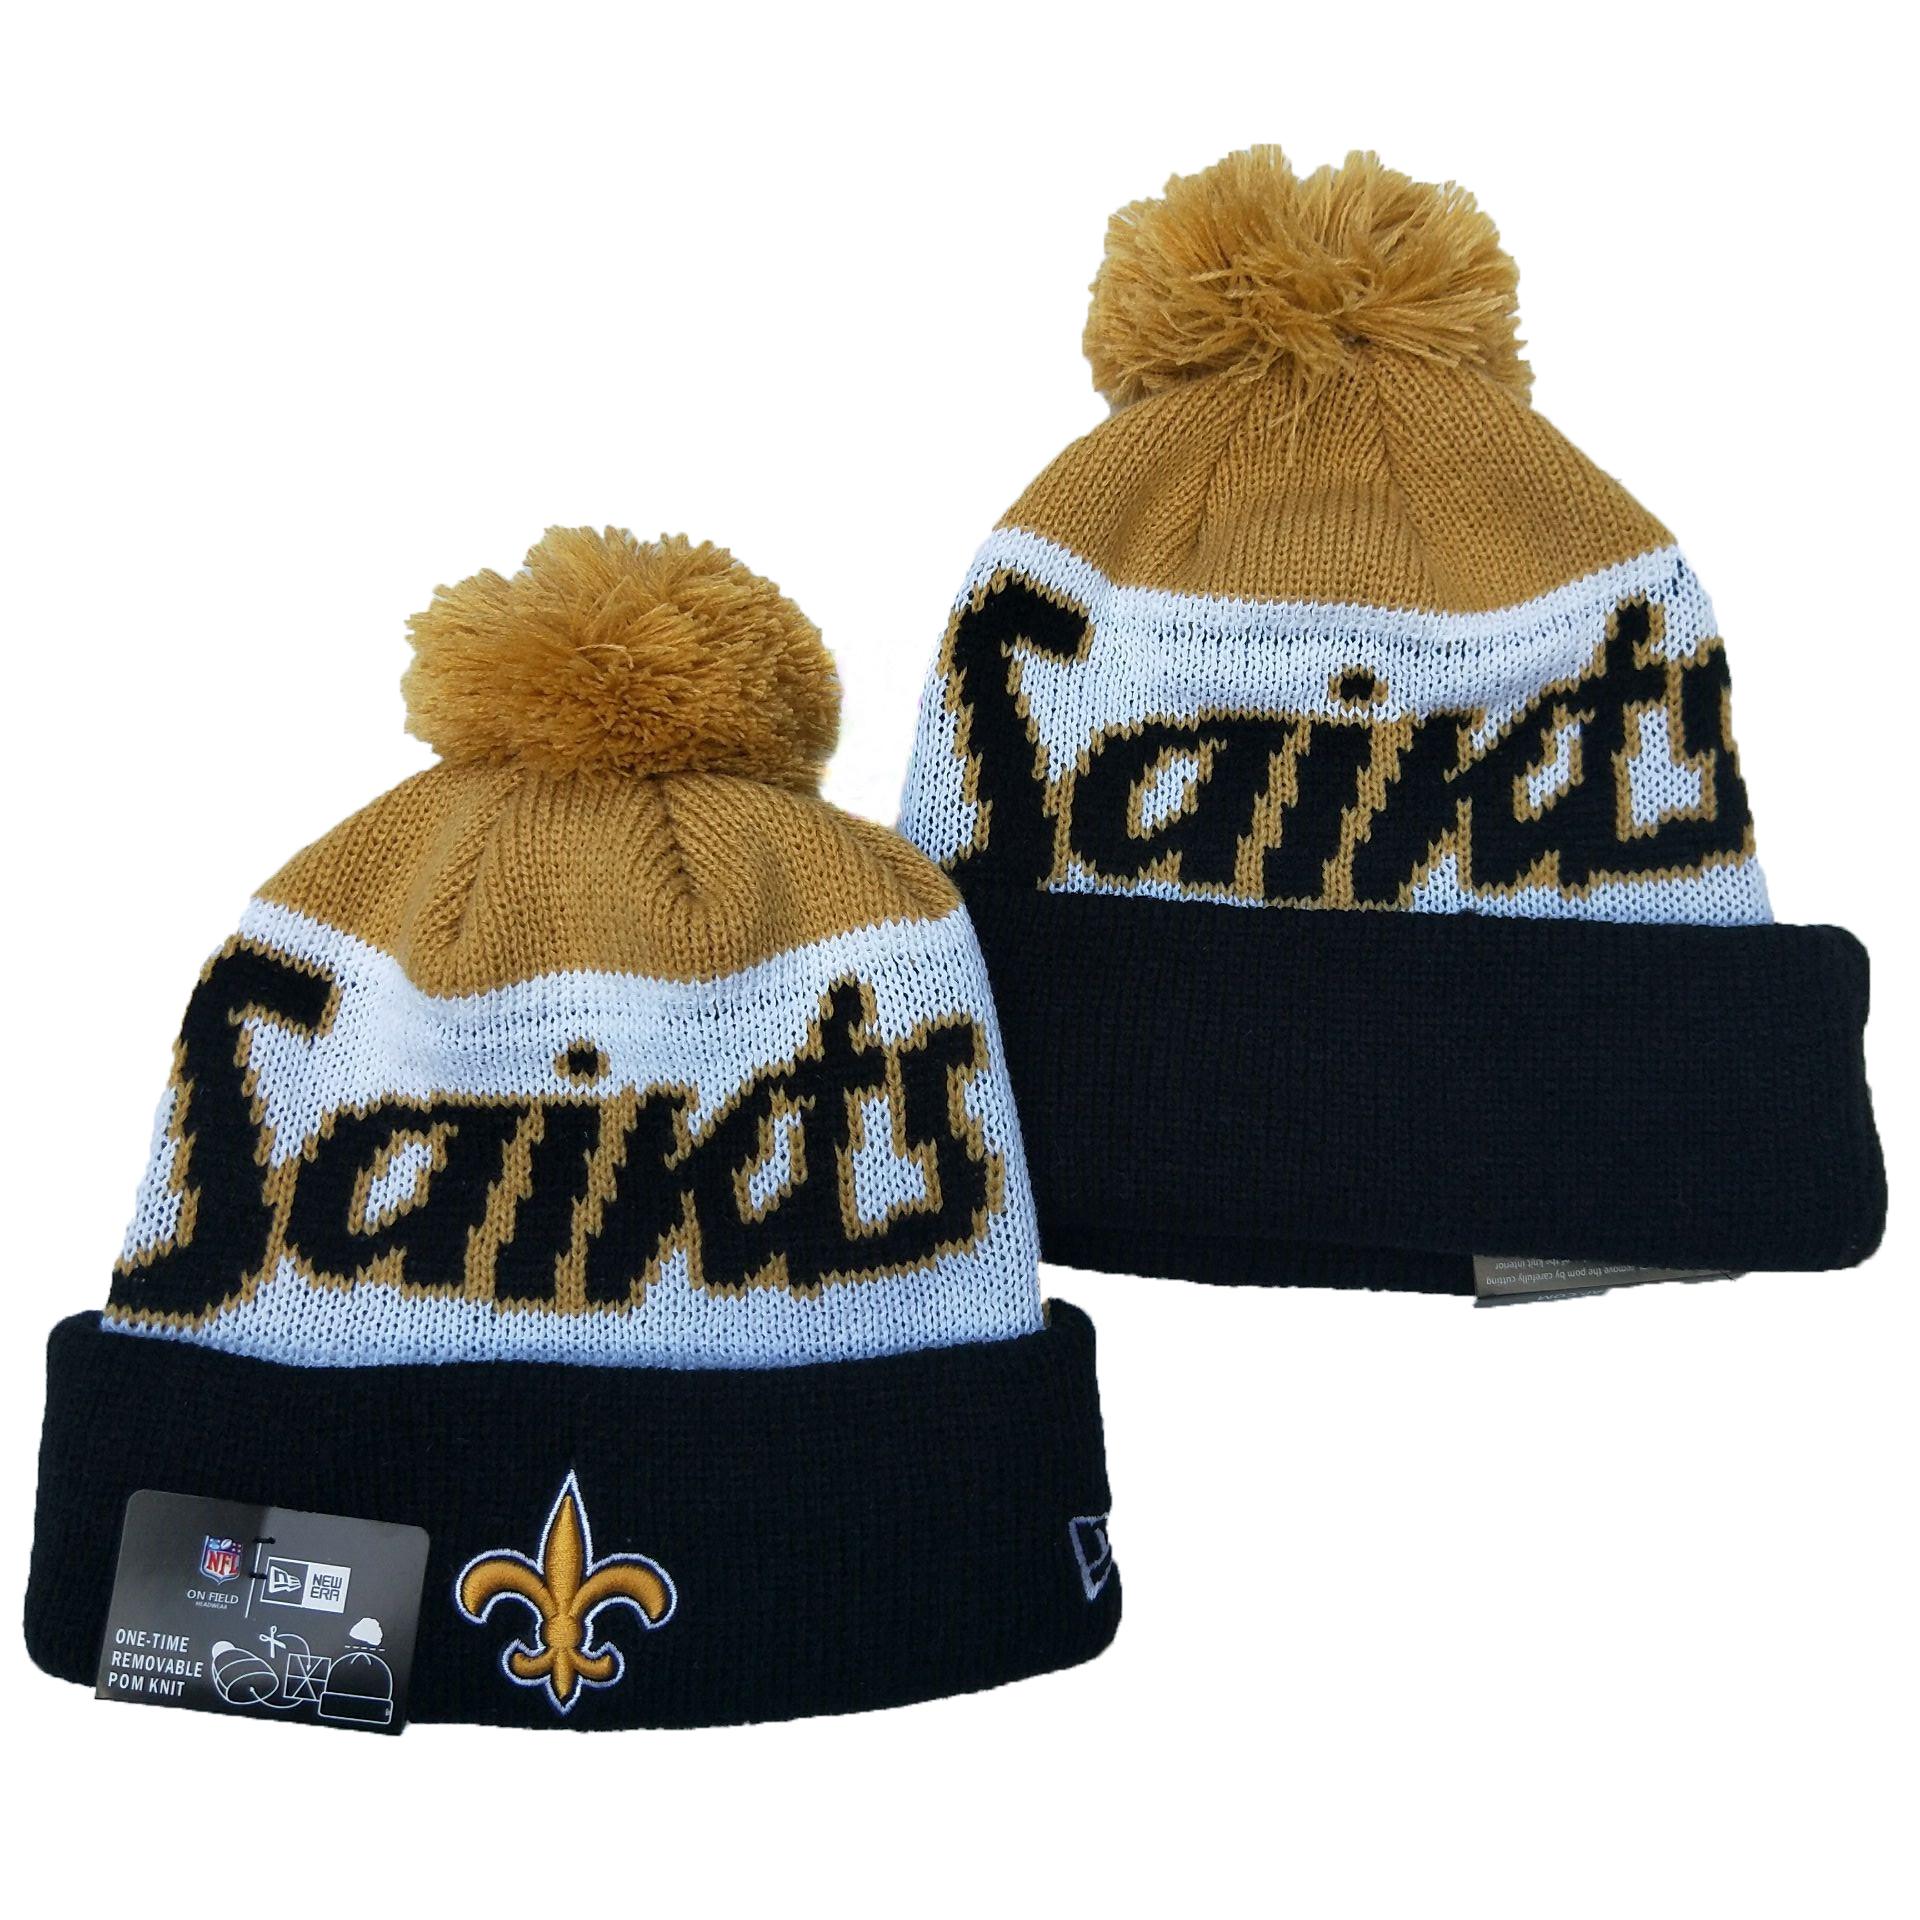 Saints Team Logo Cream White Black Pom Knit Hat YD